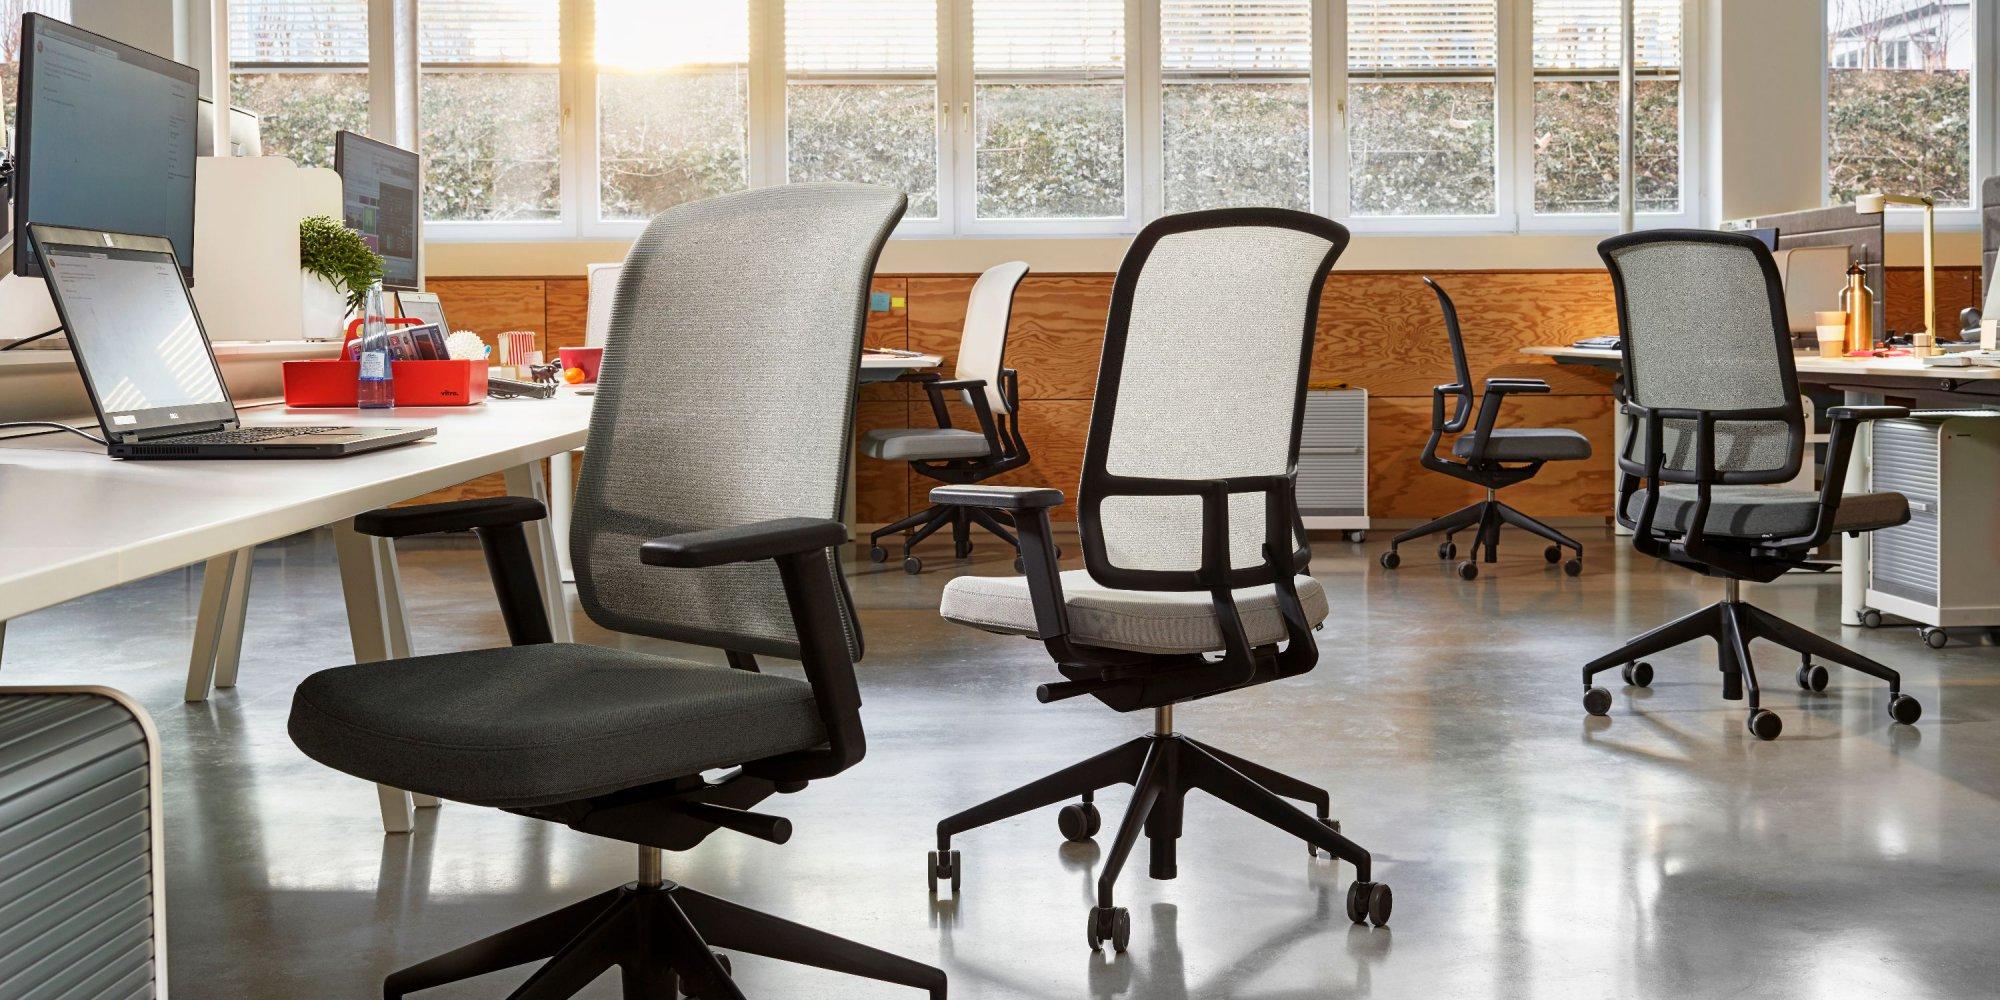 am-chair-1760960-master